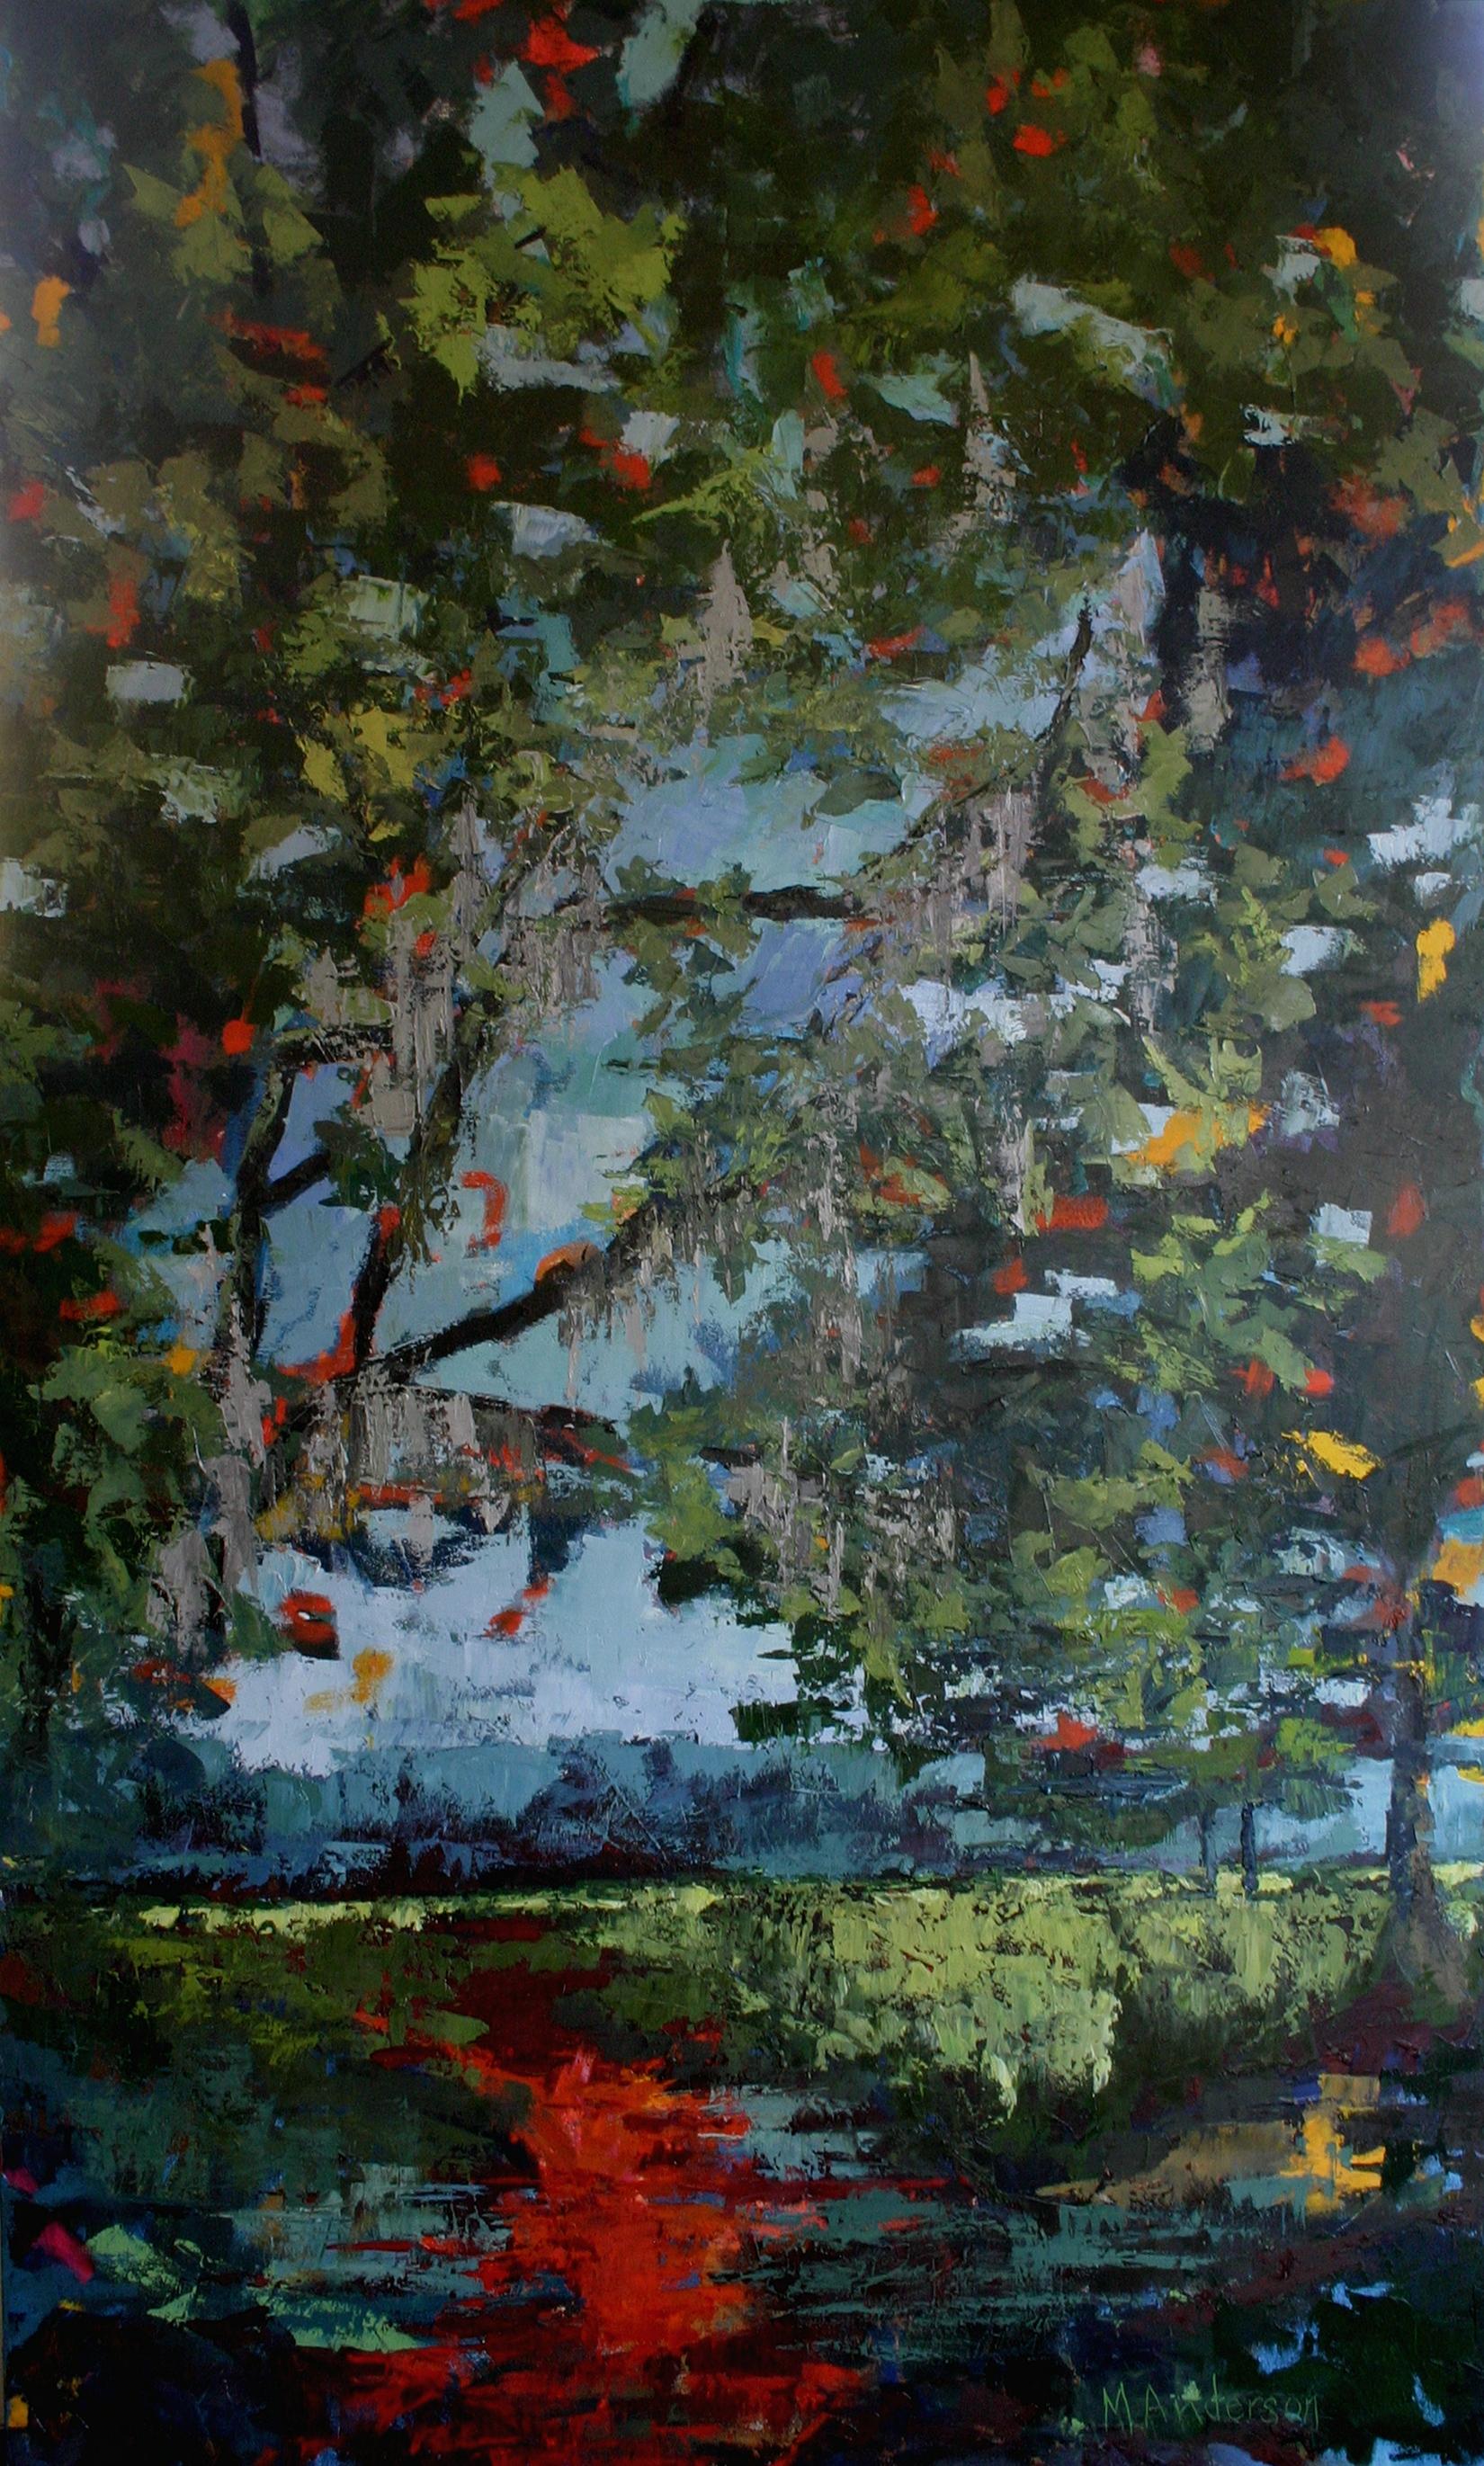 Hilton Head Sea Pines (36x60 Canvas) - Sold